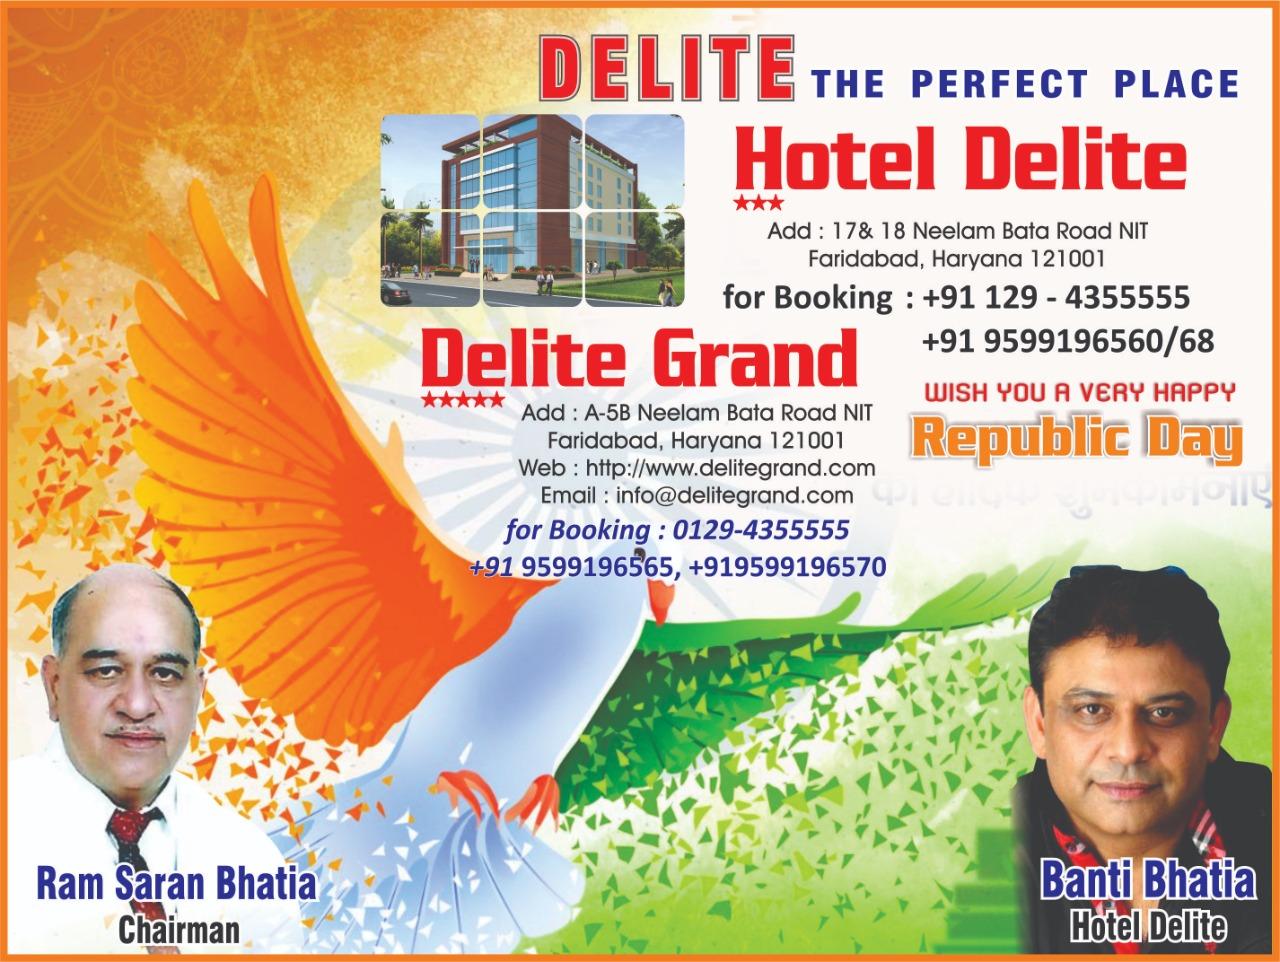 Republic day wish by hotal delite